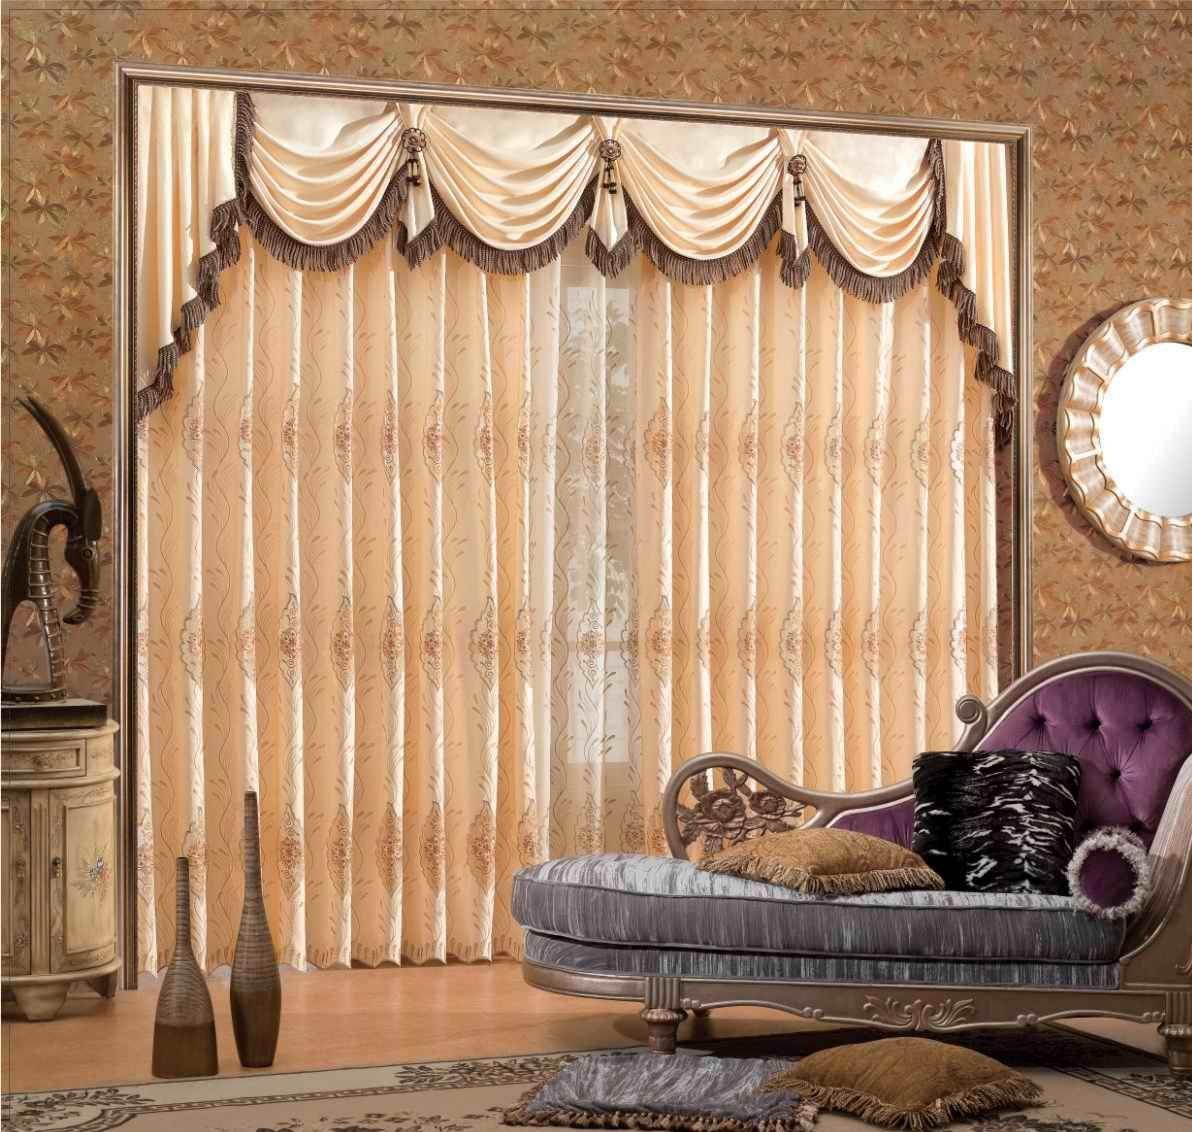 European window coverings  arab style curtains  buy arab style curtainseuropean style